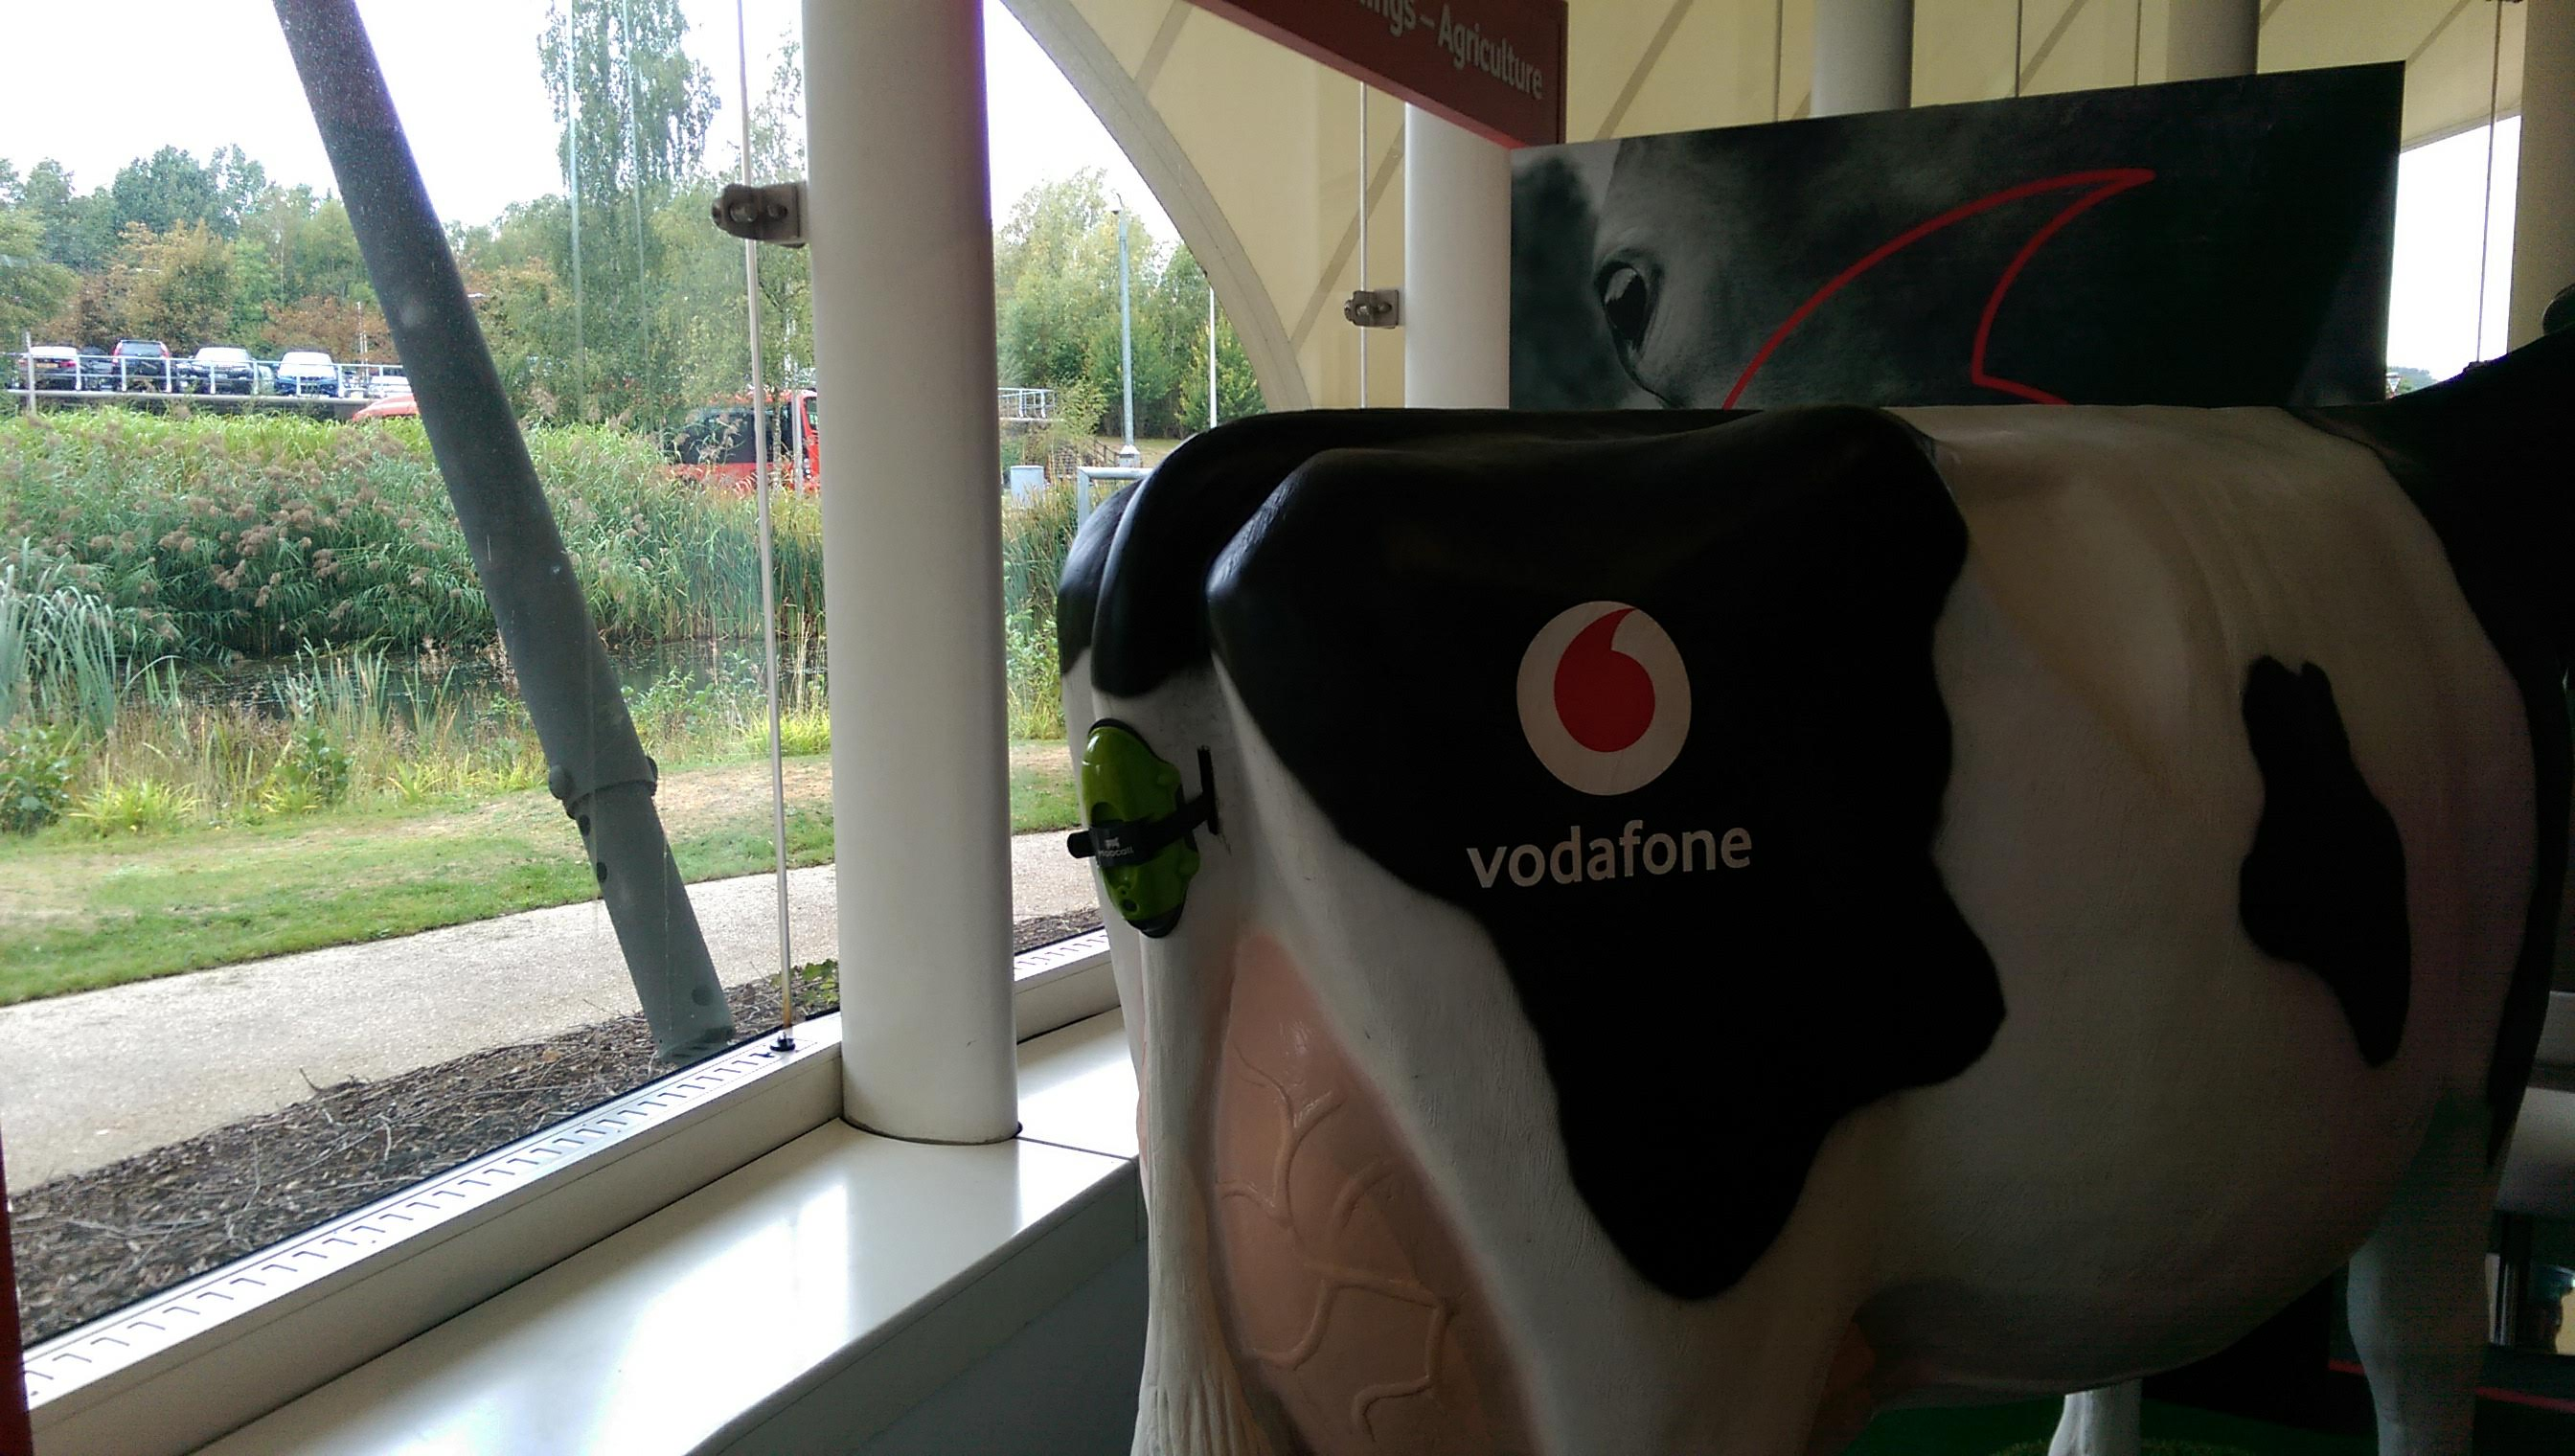 Vodafone Cow